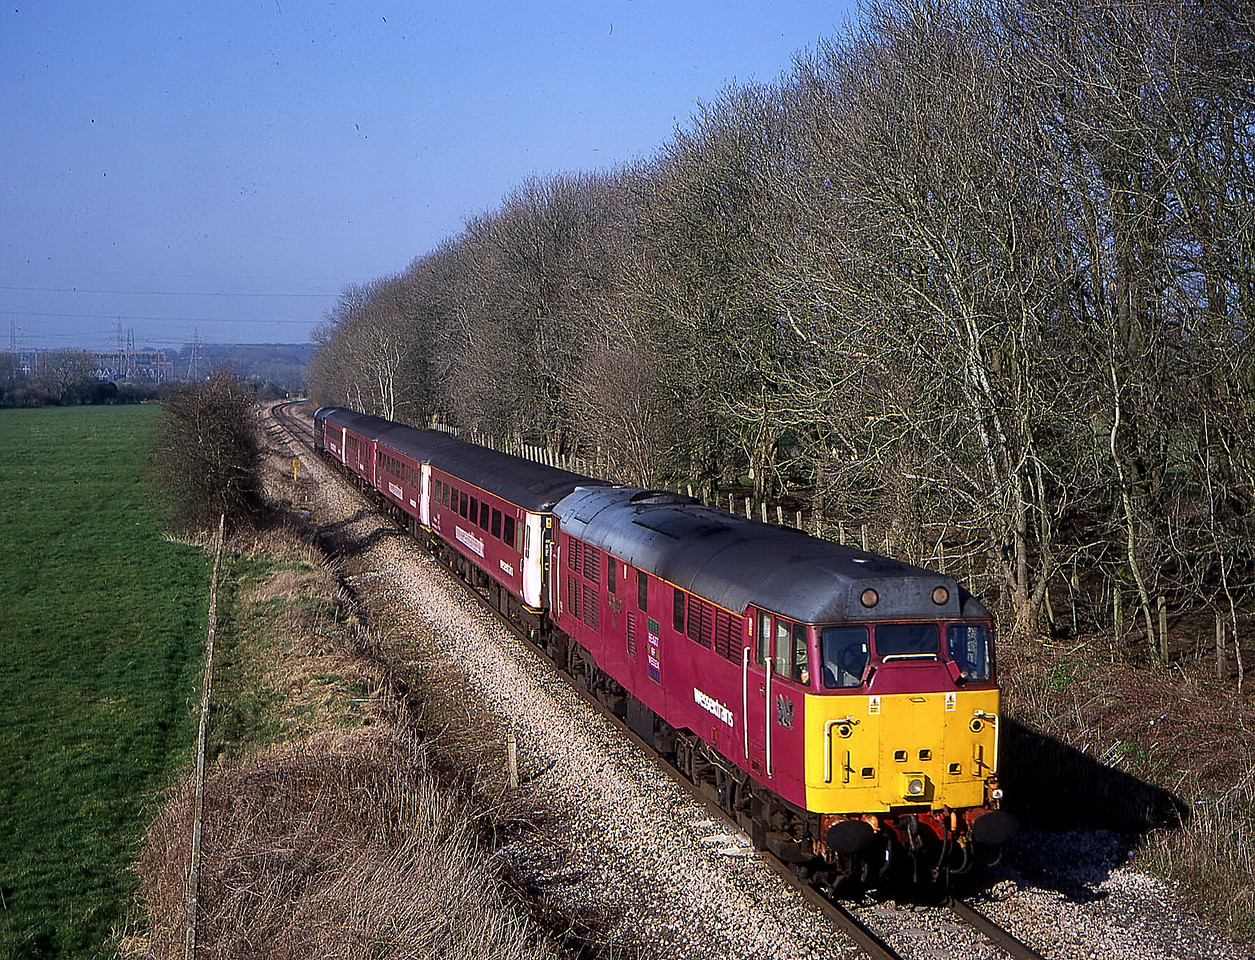 31601 leading 31459 on 1423 swindon to soton on single line at melksham 19 march